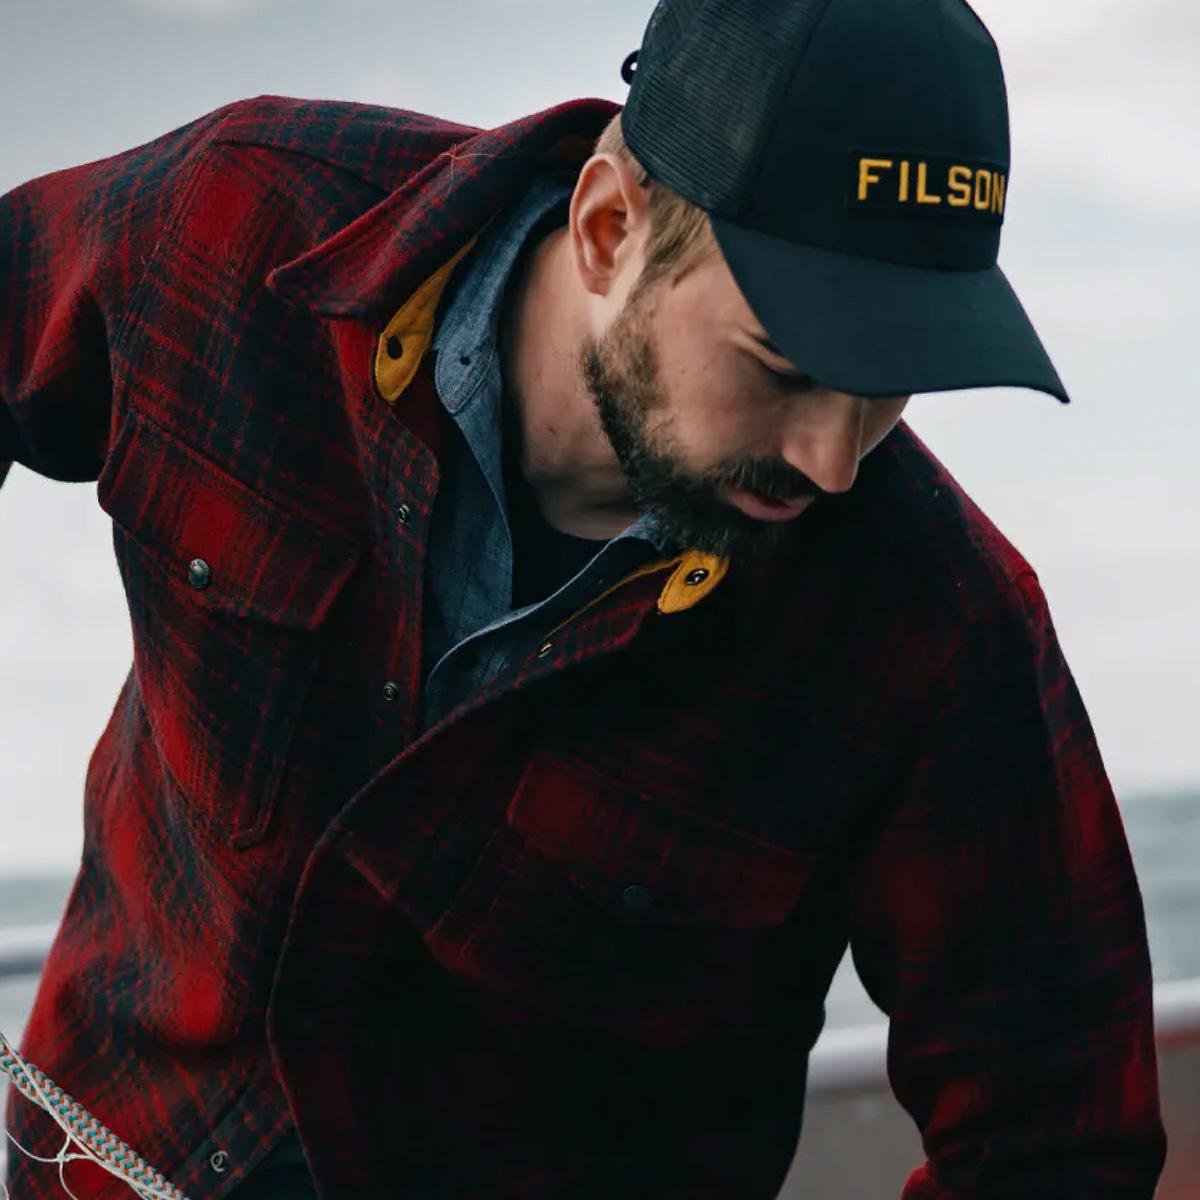 Filson Mesh Snap-Back Logger Cap 20189203 Black, slijtvaste pet met geborduurd Filson logo patch en mesh-bescherming